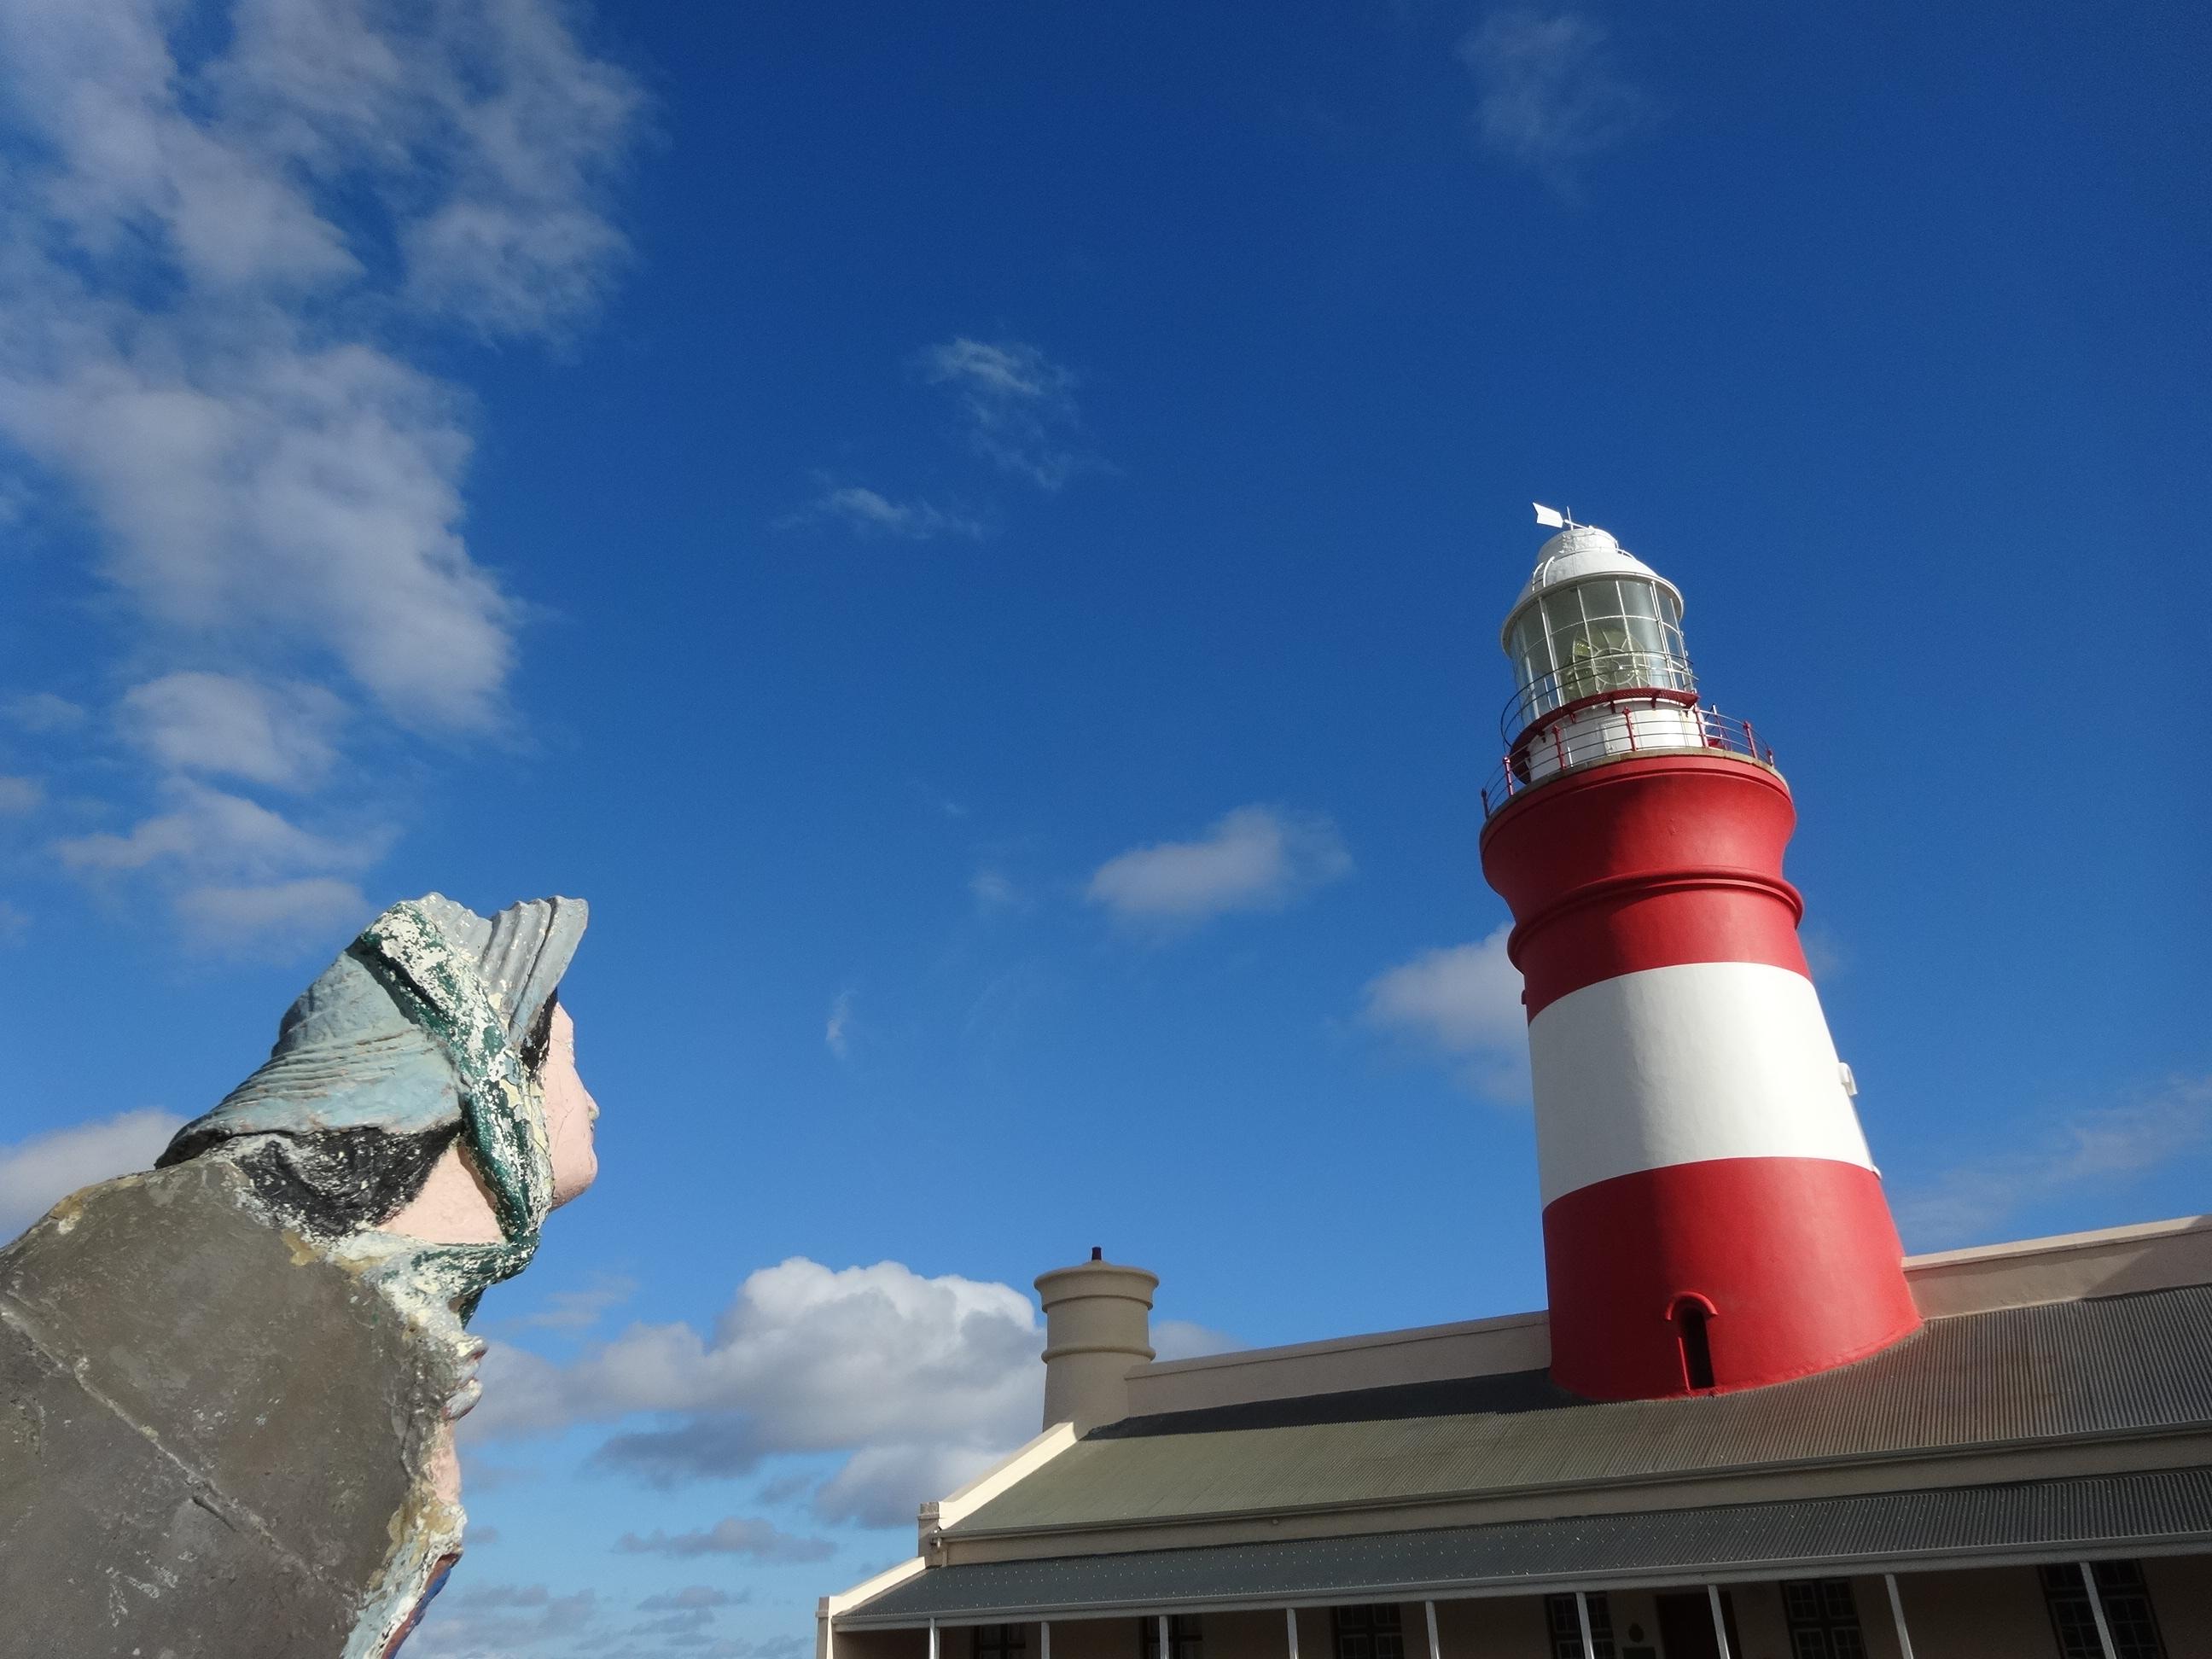 Vissersvrouw en vuurtoren in Cape Agulhas